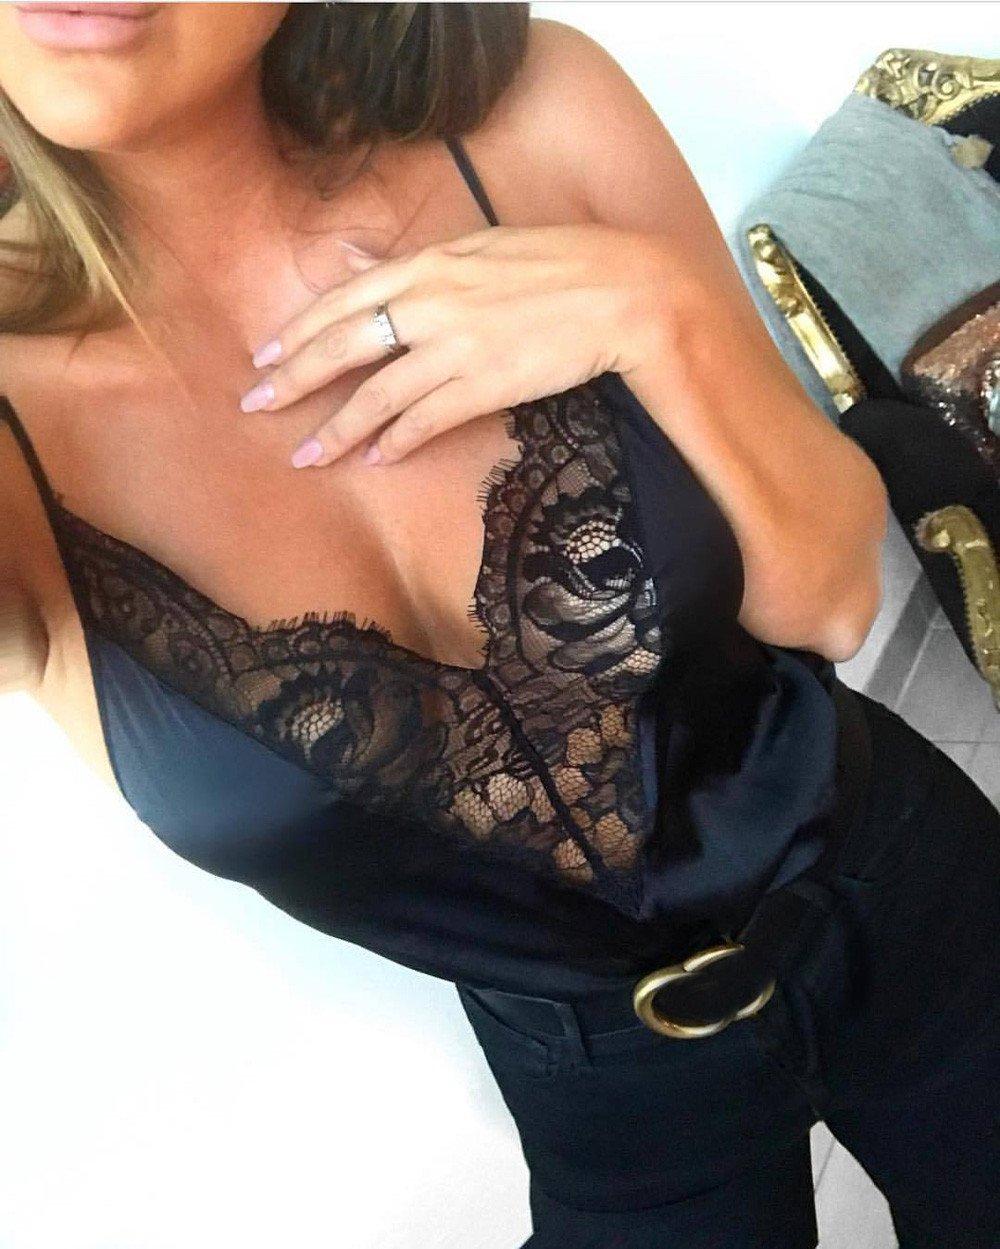 2019 Women Tank Blouse T-Shirt,Ladies Lace Vest Sleeveless Loose Crop Tops (M, Black) by Woaills-Dress (Image #6)